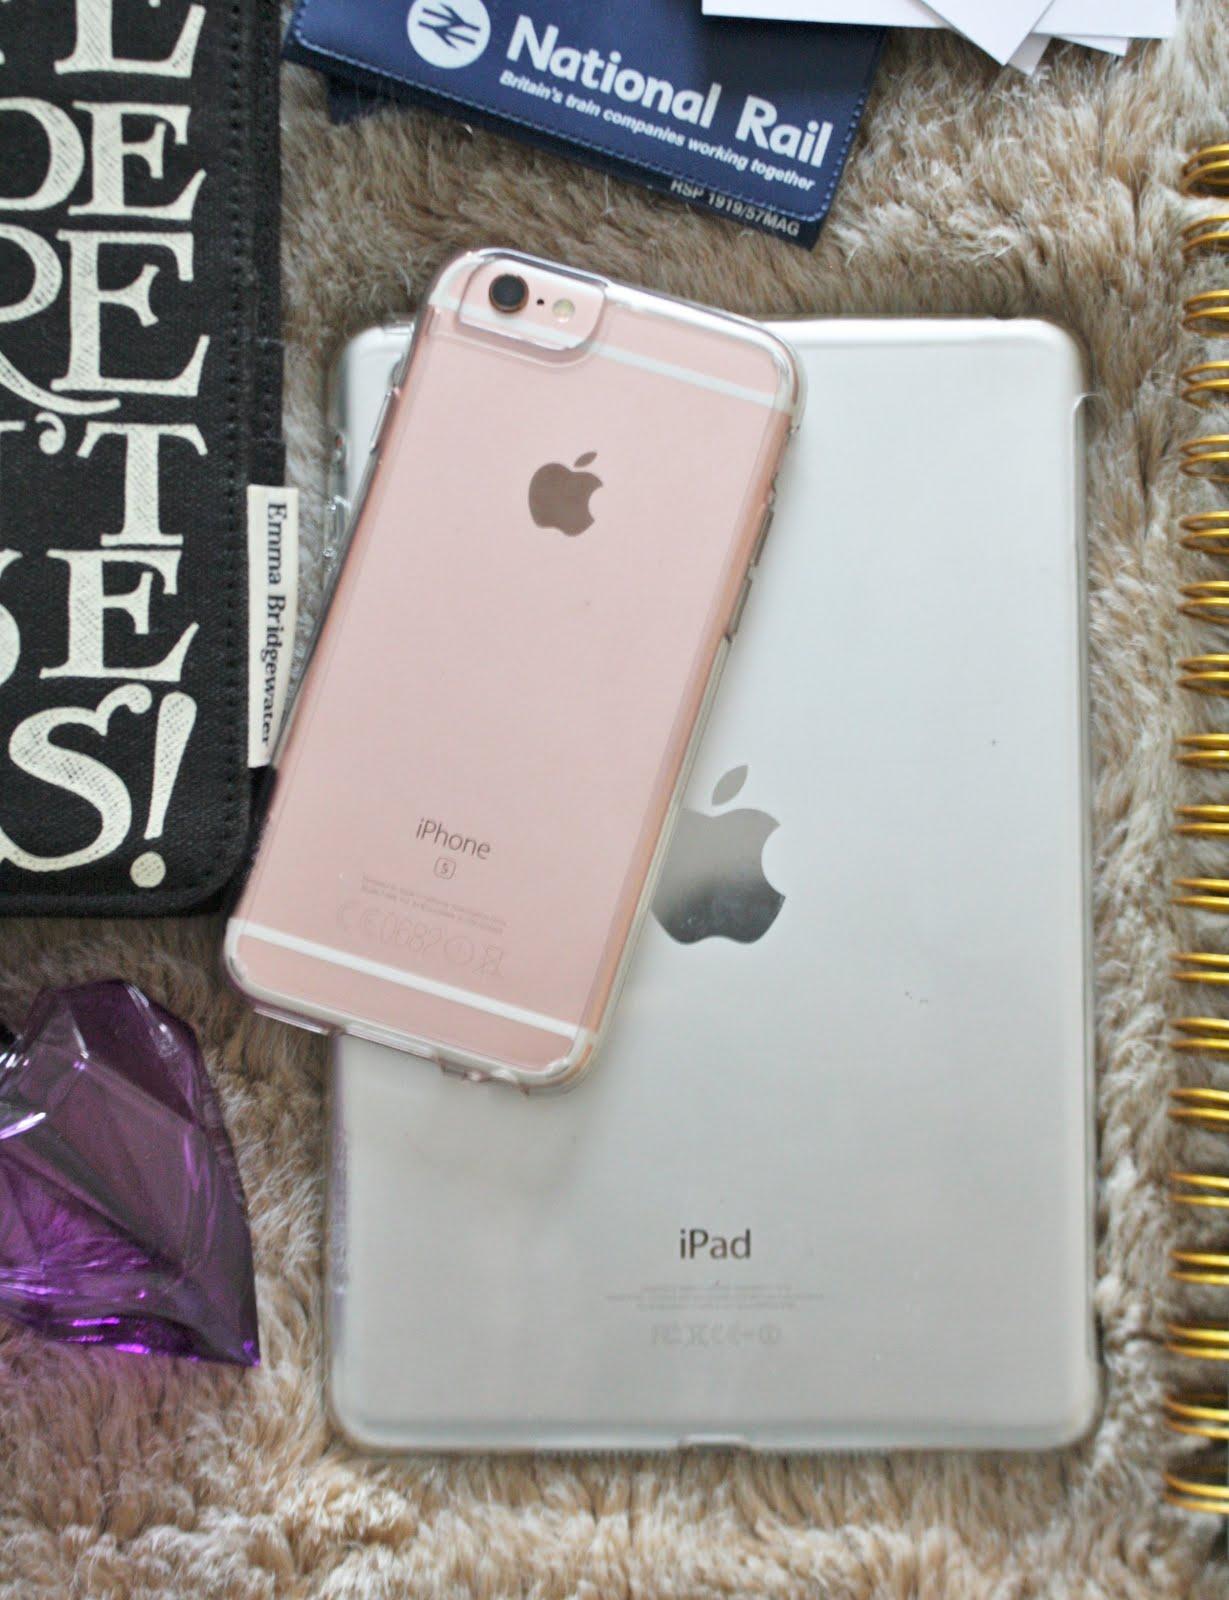 blogger essentials, flatlay, blogger event, london, travel essentials, travel kit, emma bridgewater, iphone 6s, iphone 6, iphone 6s case, ipad mini, iphone, ipad, 64gb